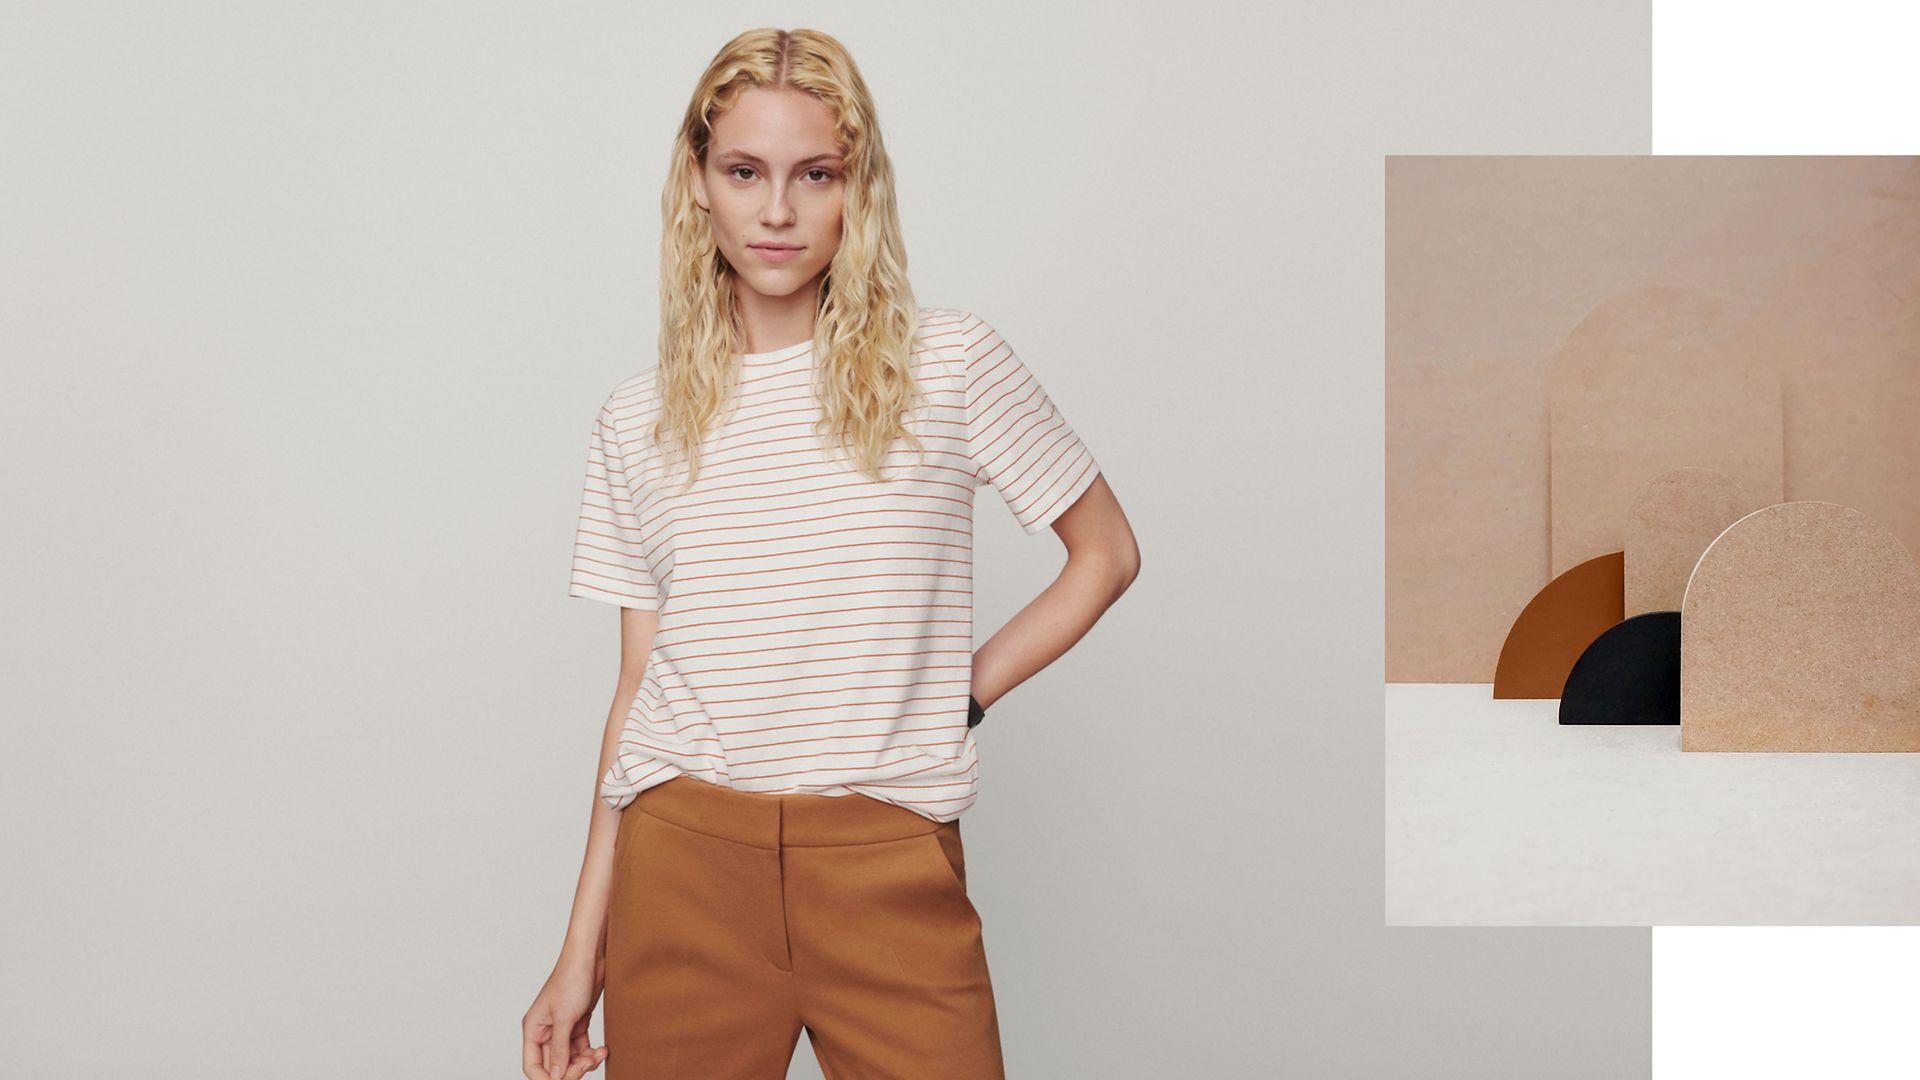 072021 - Women - Inspiration - Lookbook - Simply perfect pants - Hero Large 2 IMG